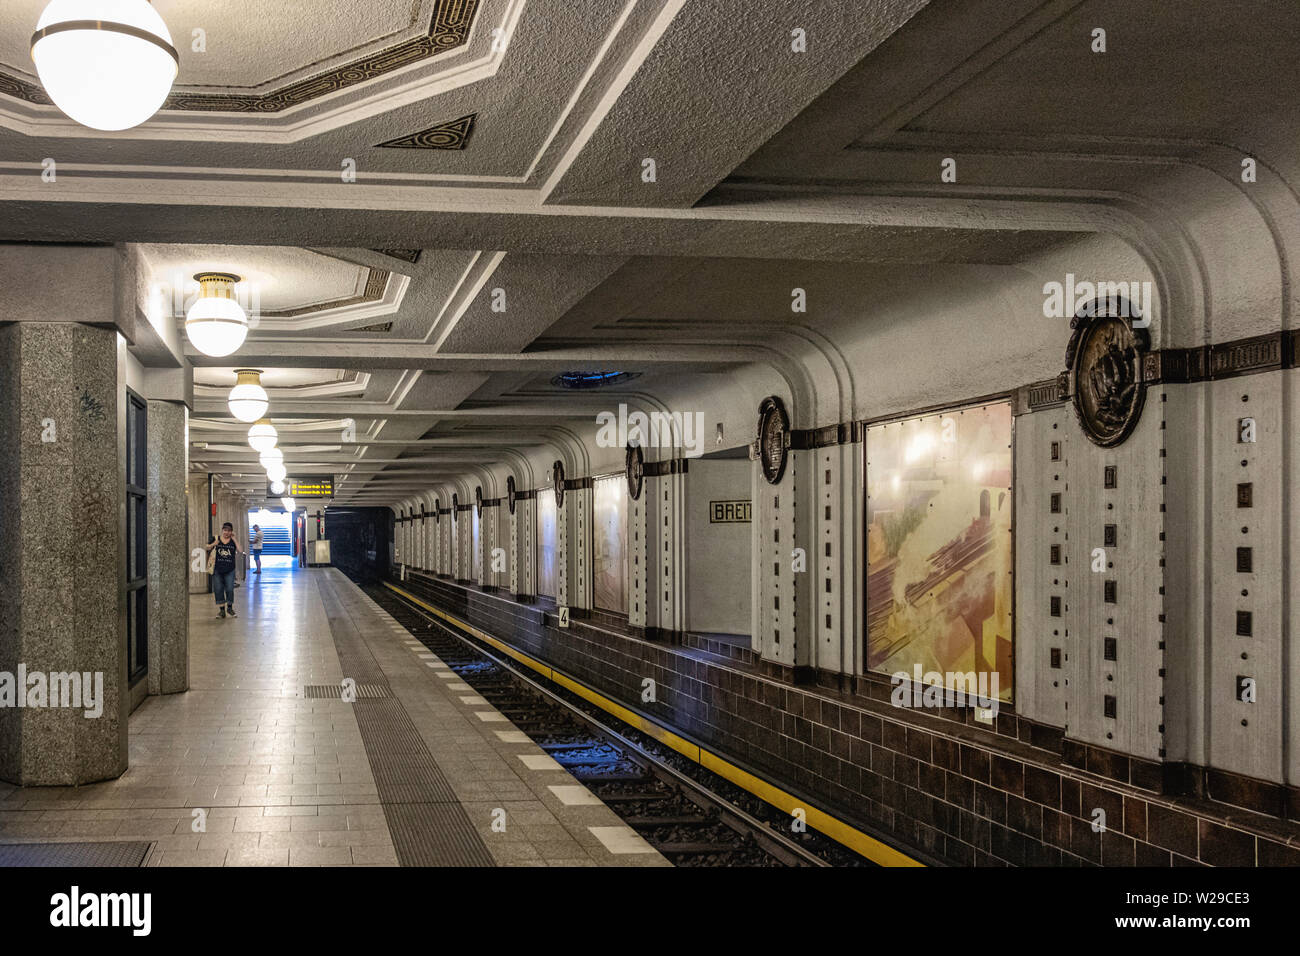 https www alamy com berlin dahlem districtbreitenbachplatz u bahn underground railway station interior platform decorative tiles medallions old paintings image259592203 html